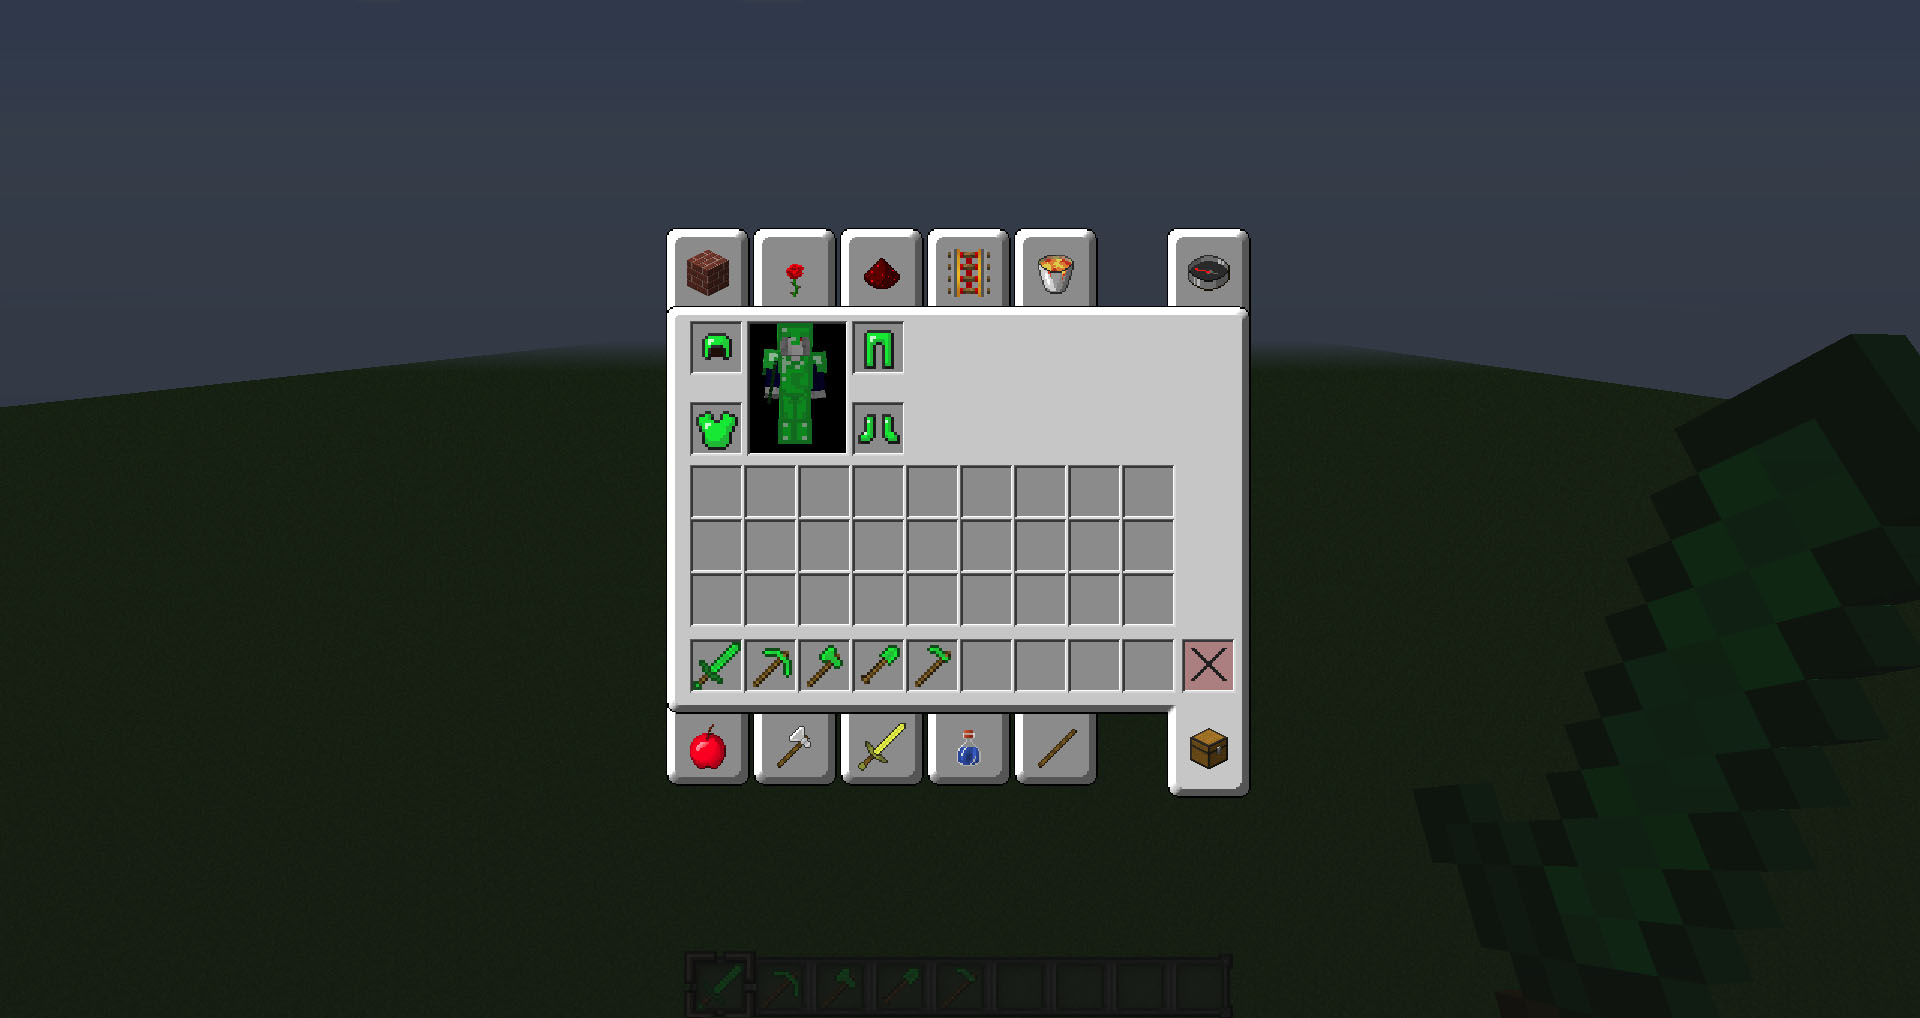 https://img2.9minecraft.net/Mod/Emerald-Tools-And-Armor-Mod-6.jpg